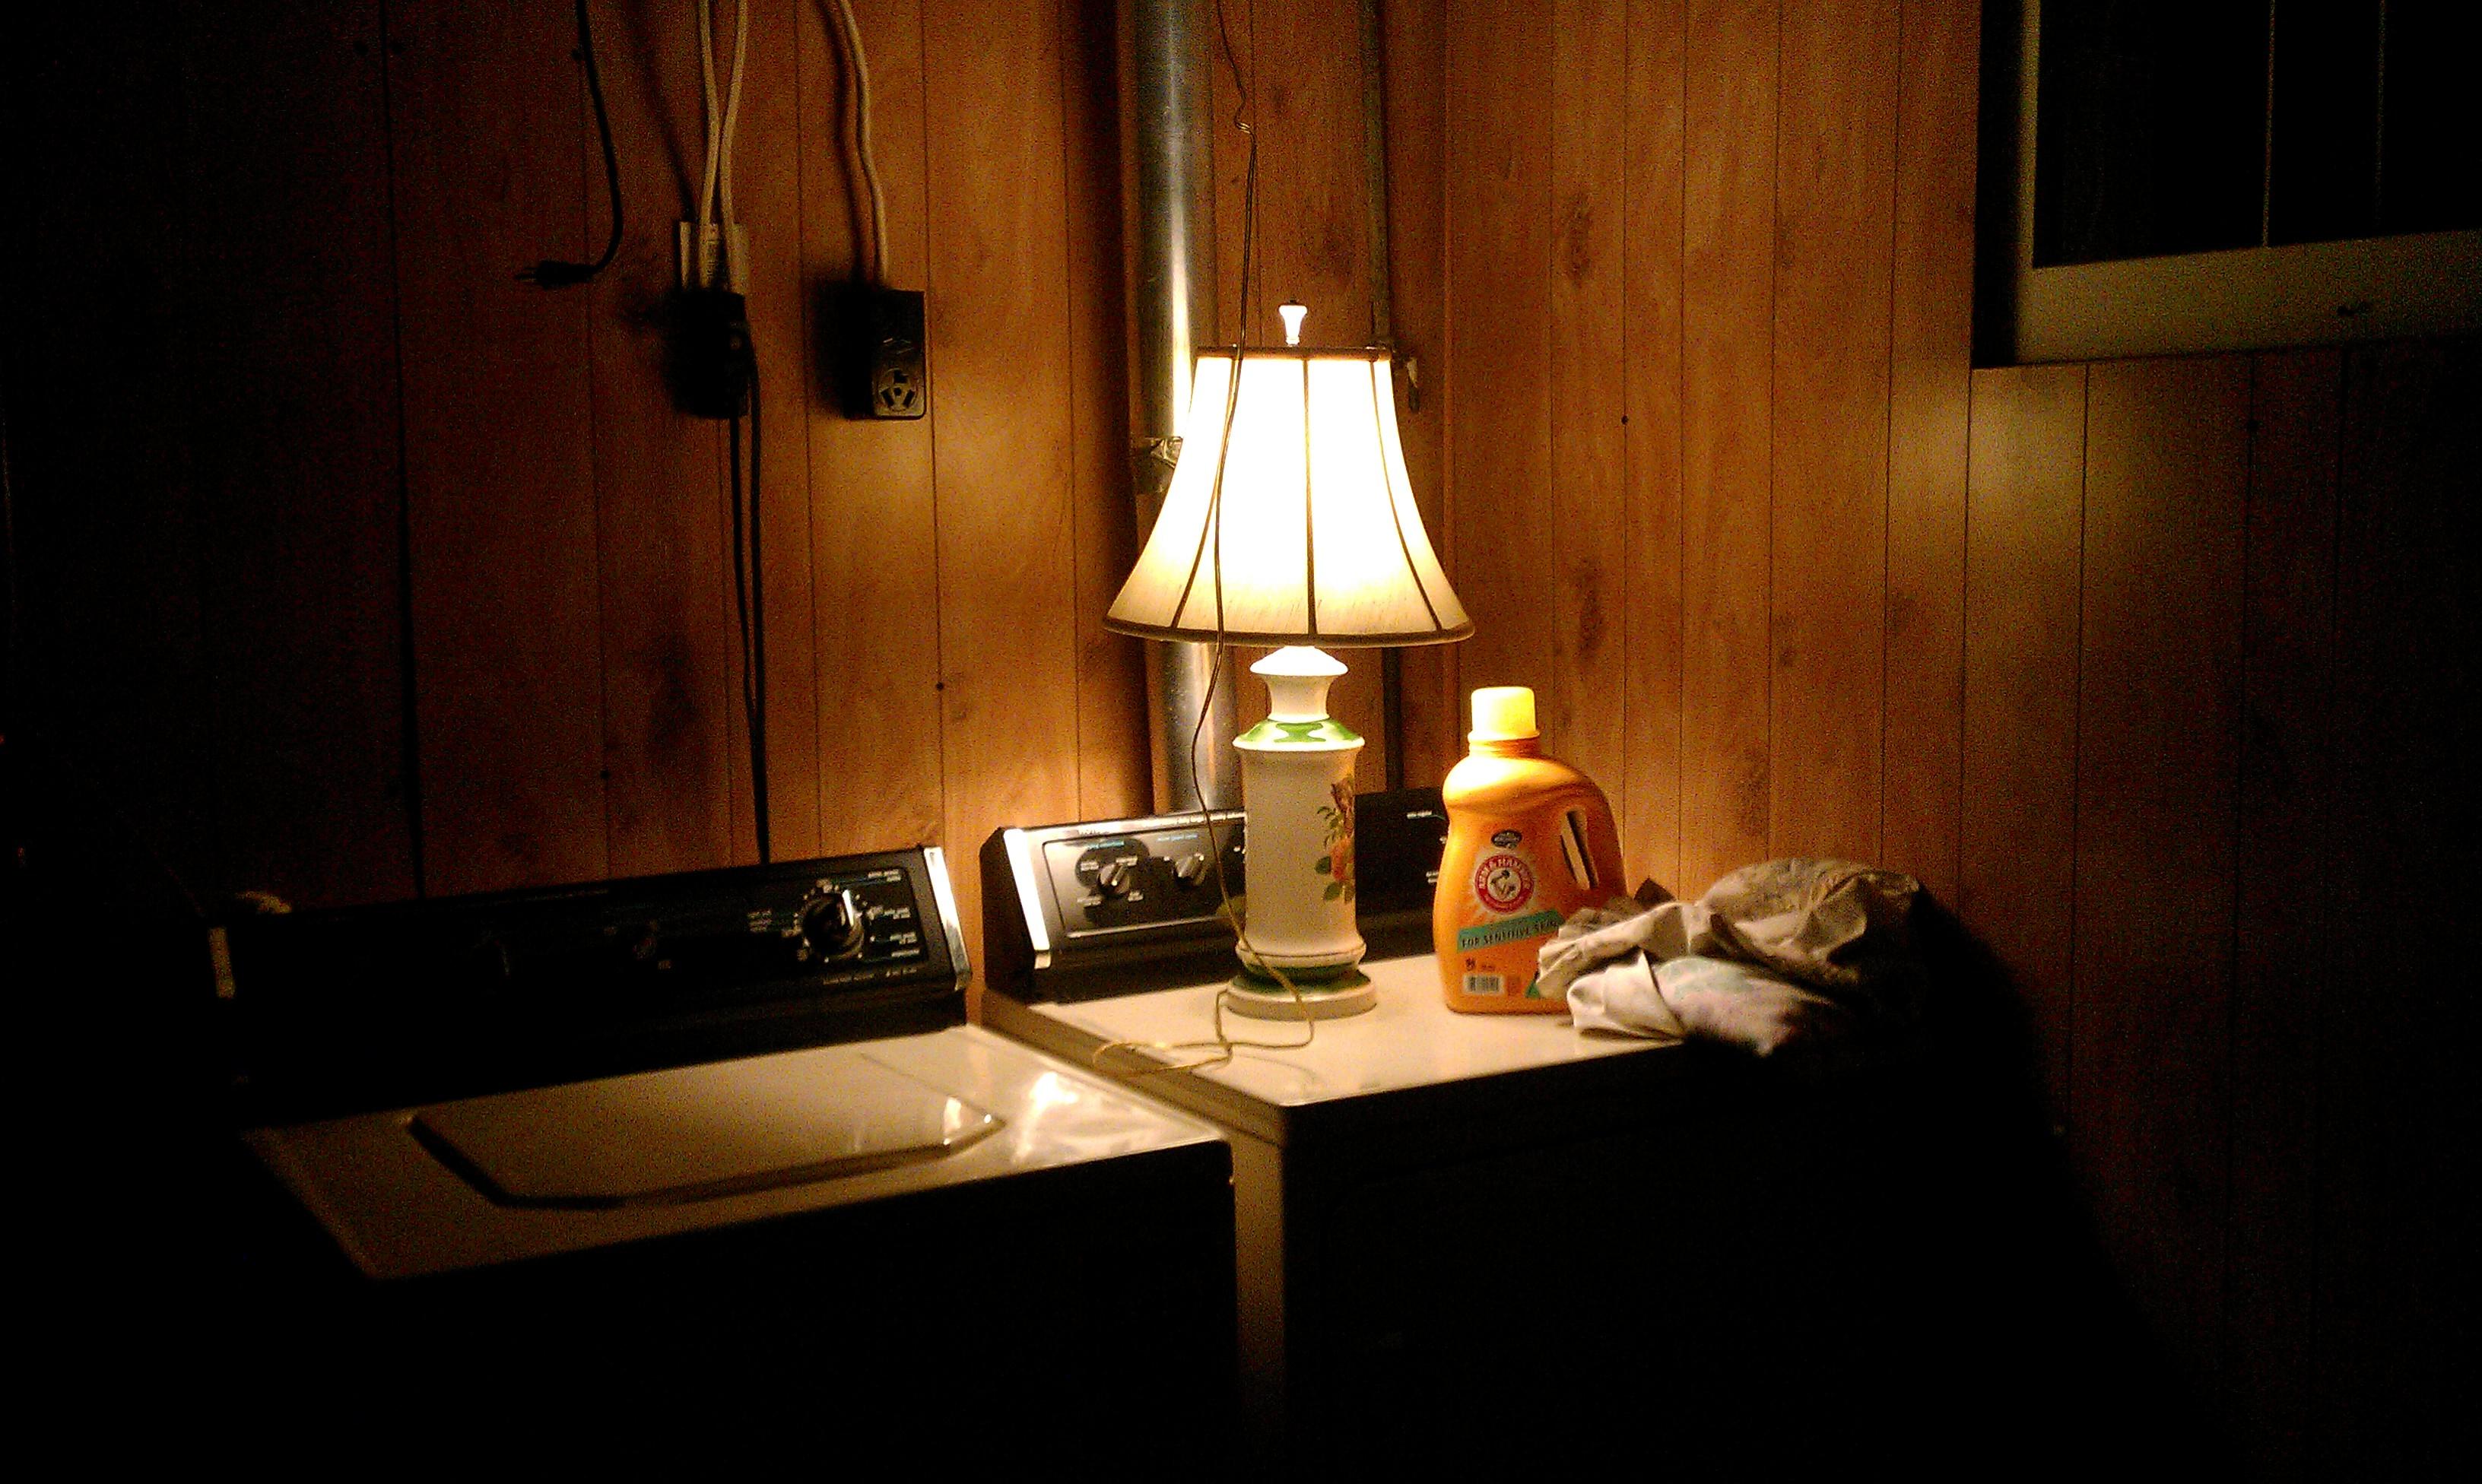 The Lamp On The Dryer Hope In The Basement Amy Allender Dot Com - Basement light fixture